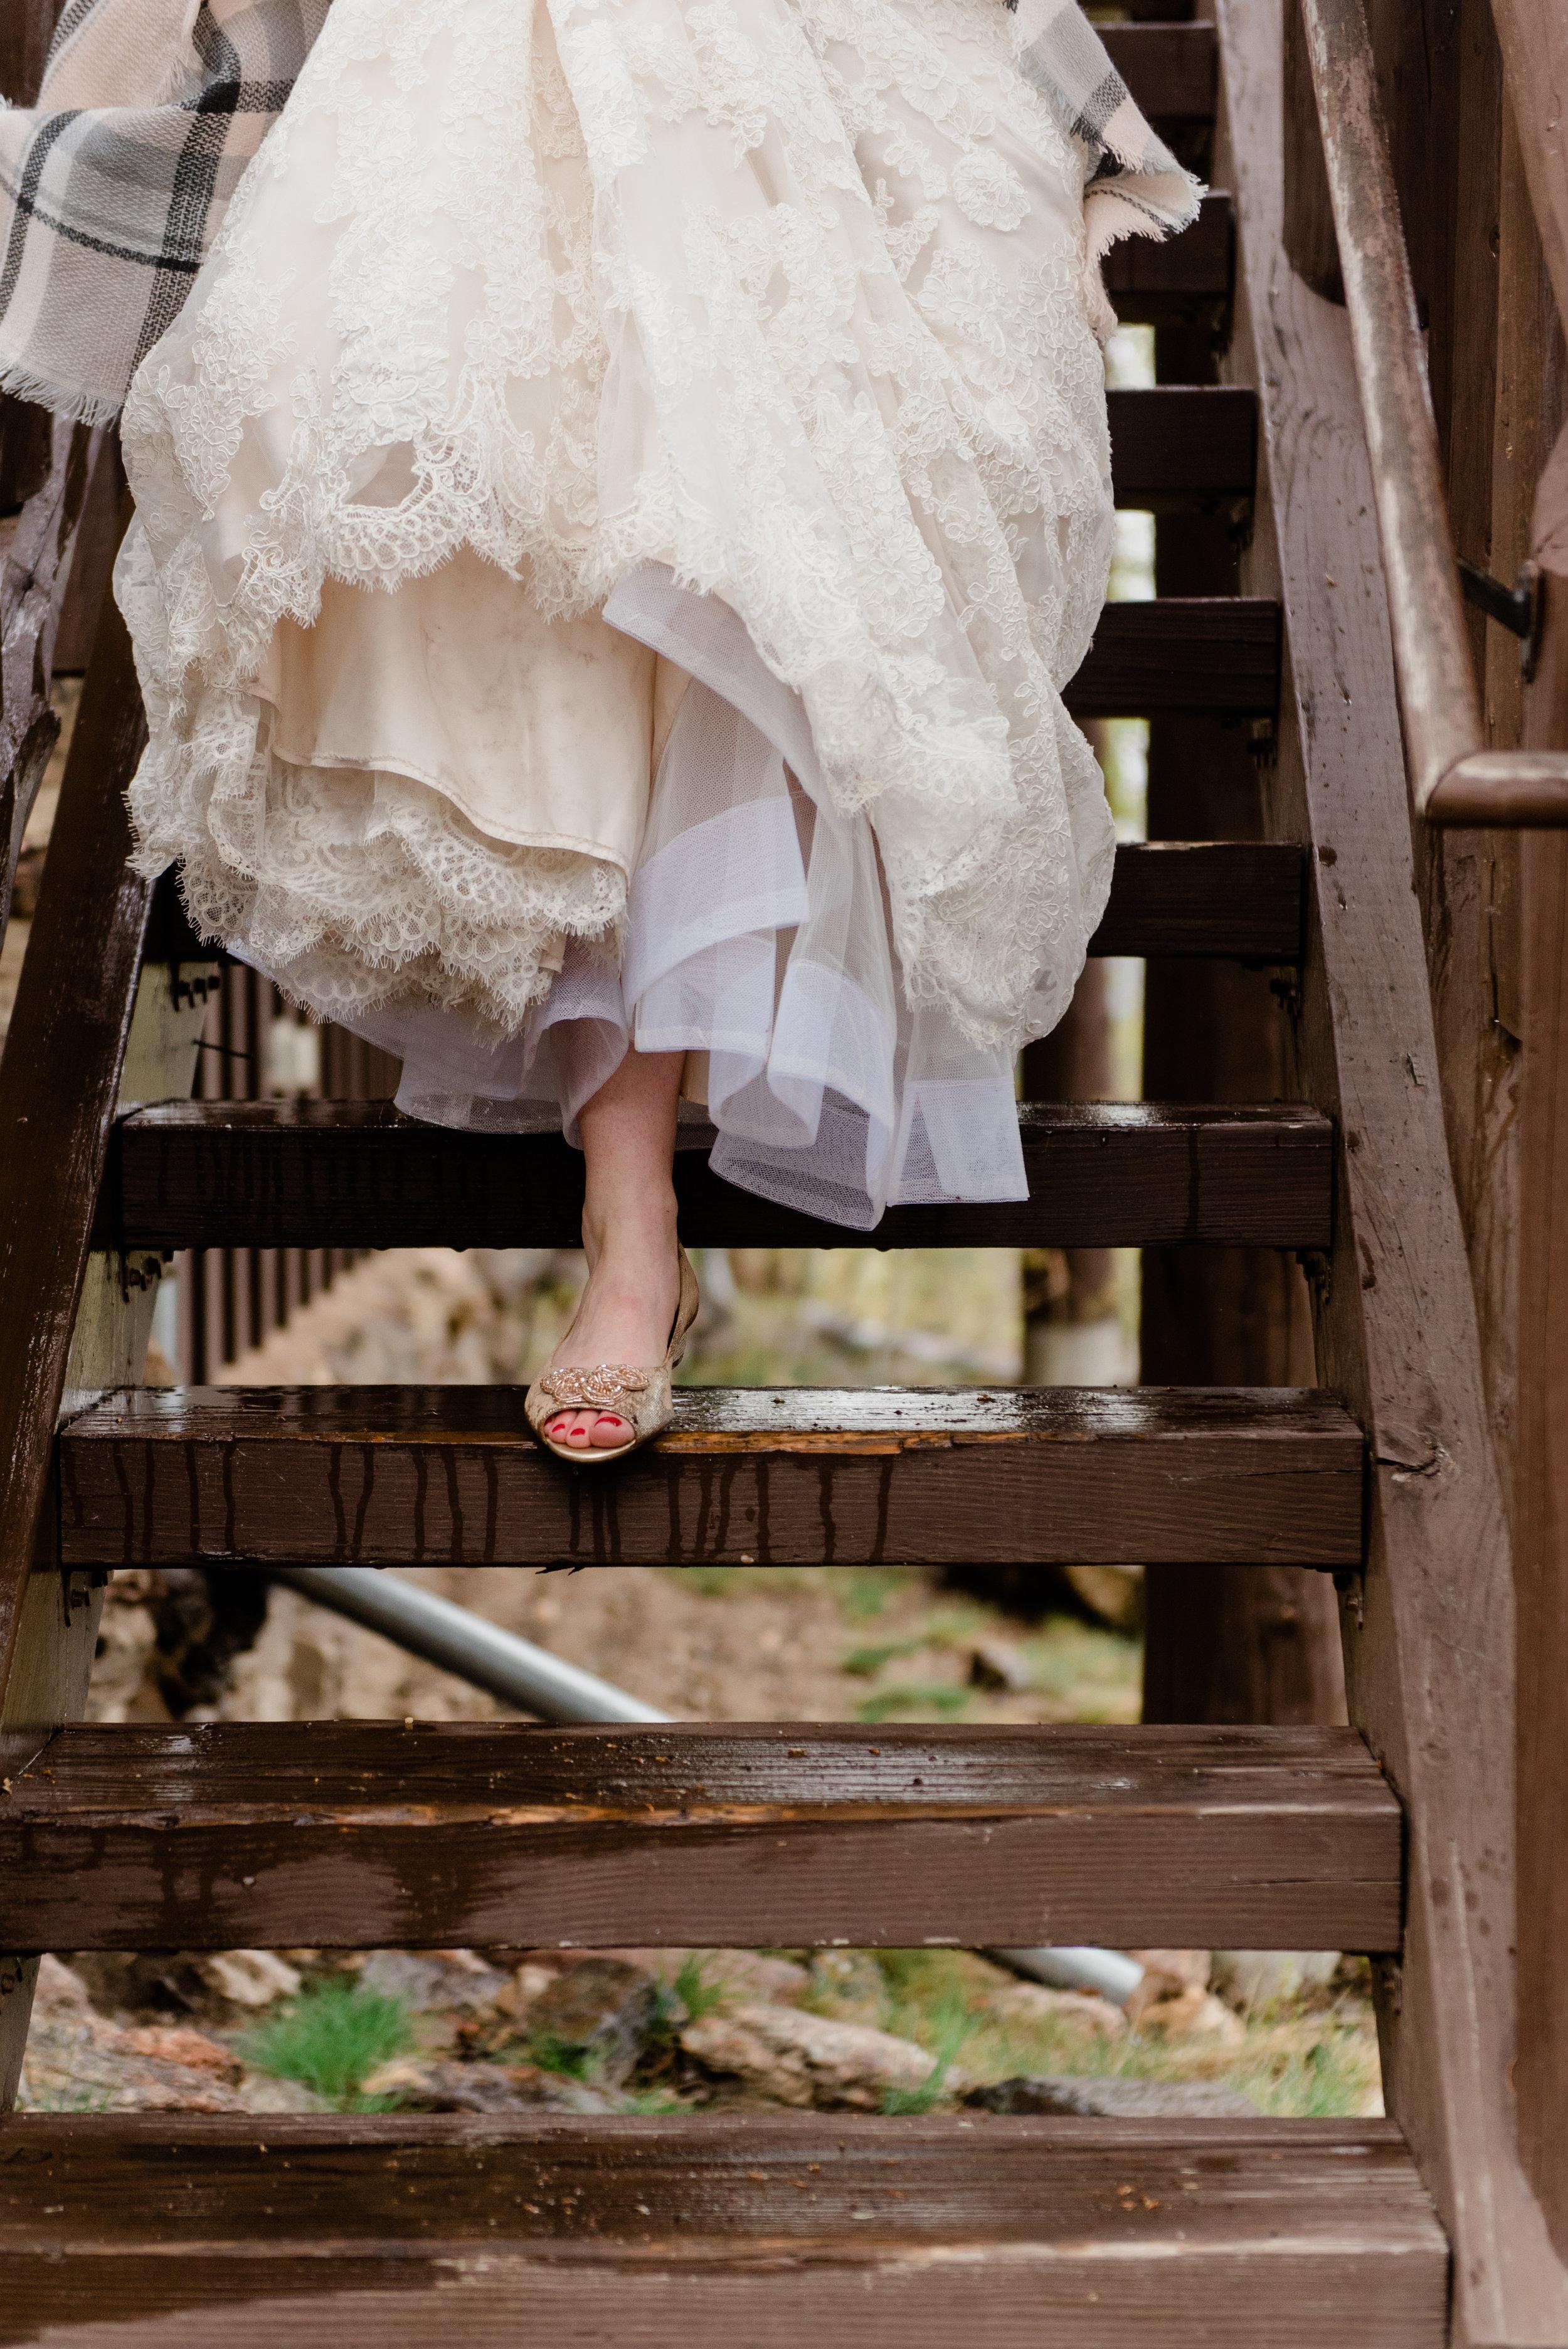 AshleighMillerWedding-EmilyJoe-Wedding-Colorado-EstesPark-2008.jpg